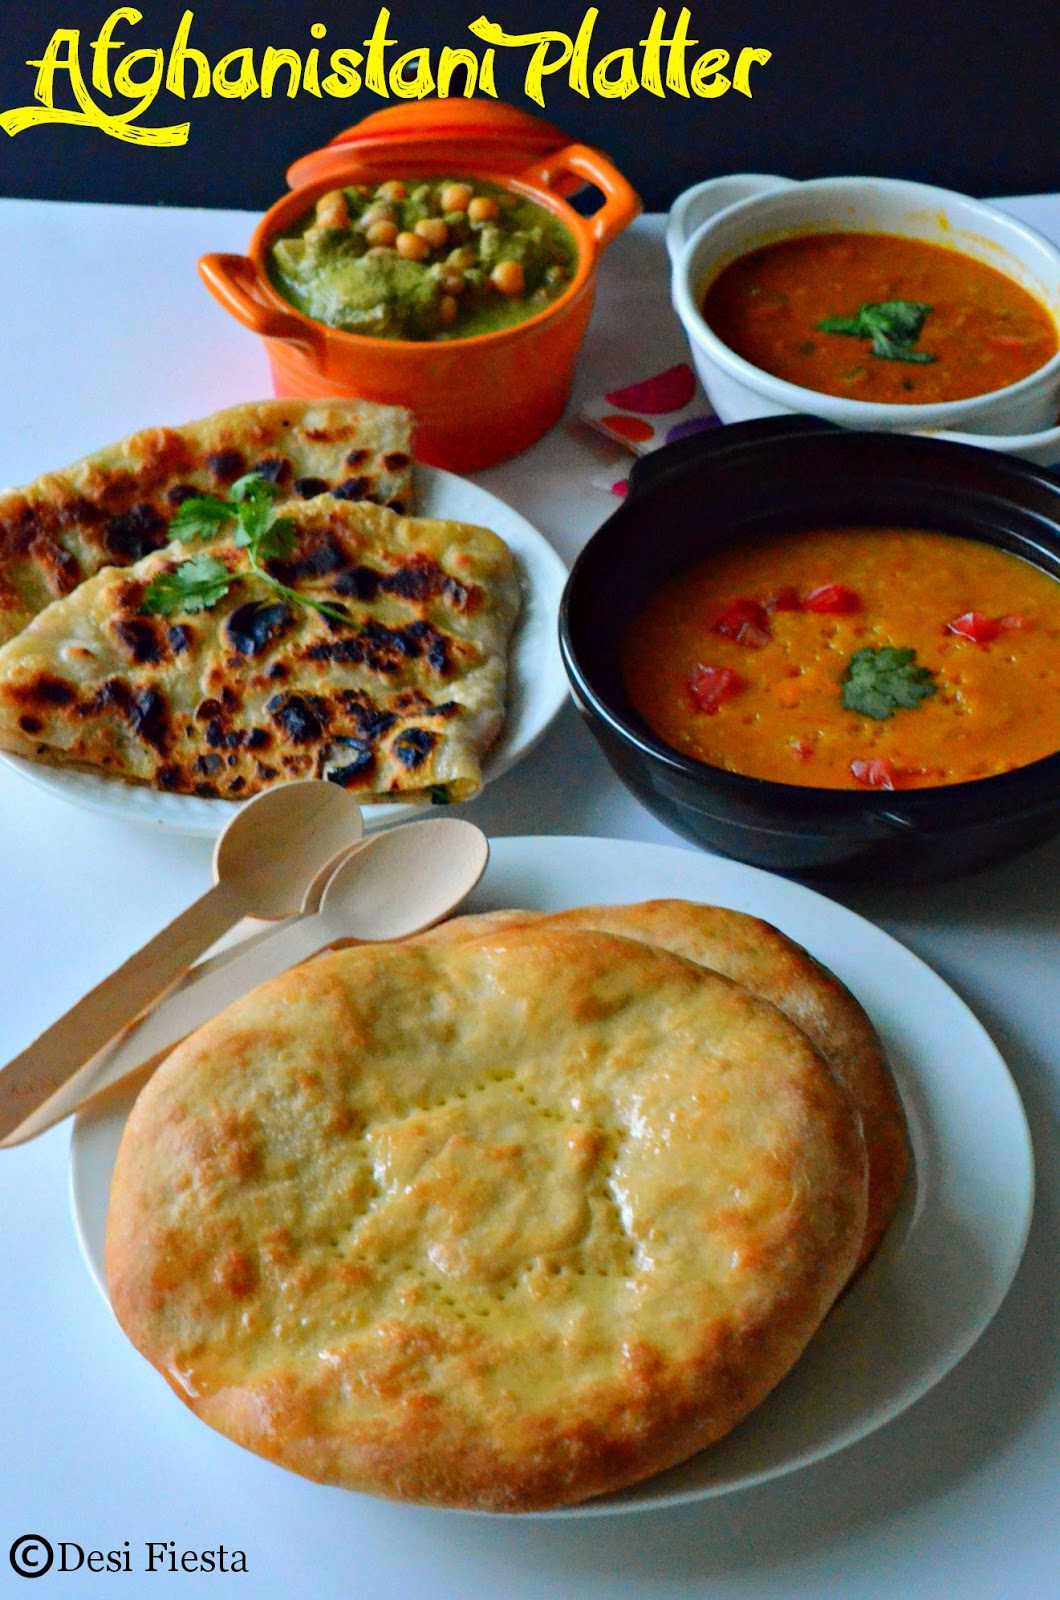 Afghani recipes